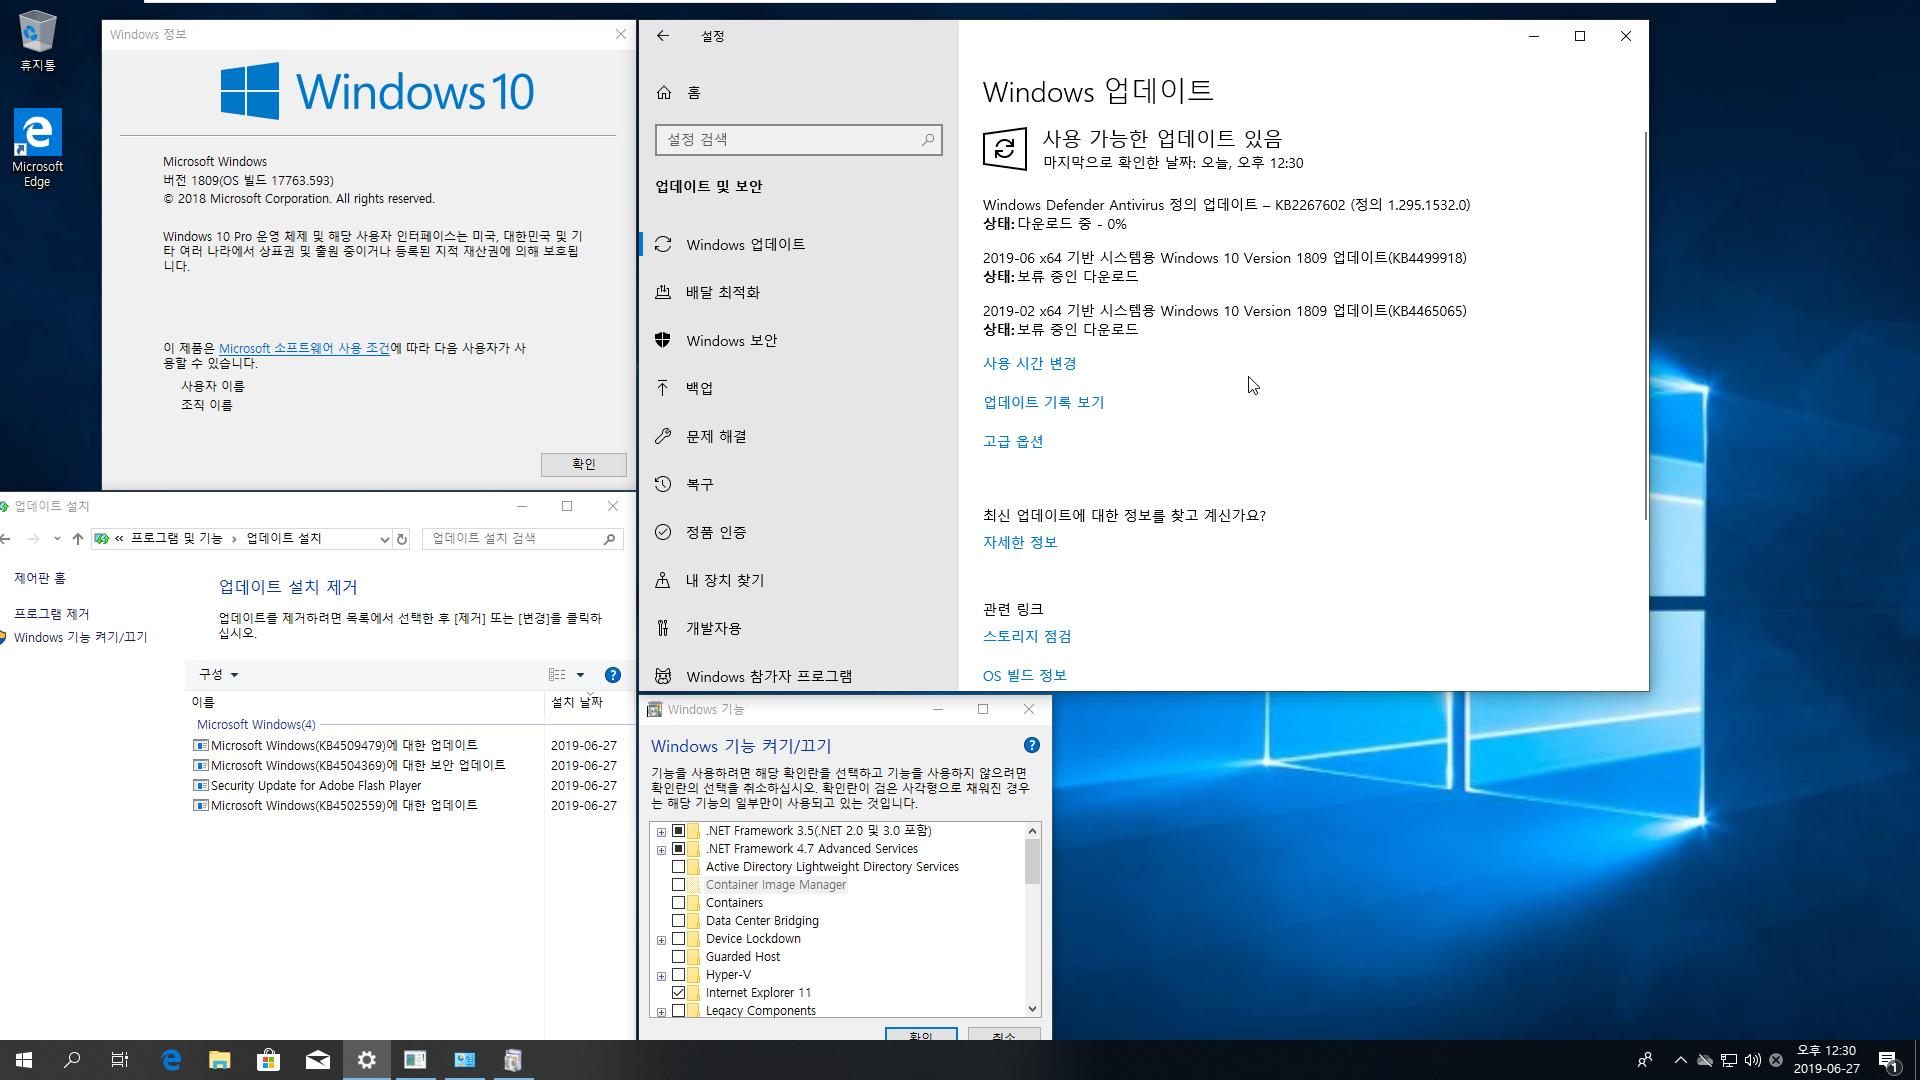 Windows 10 수시 업데이트 나왔네요. 버전 1809 ~ 버전 1703까지 -Windows 10 버전 1809 누적 업데이트 KB4509479 (OS 빌드 17763.593) [2019-06-26 일자] 통합중 입니다 - 64비트 업데이트 확인 2019-06-27_123036.png